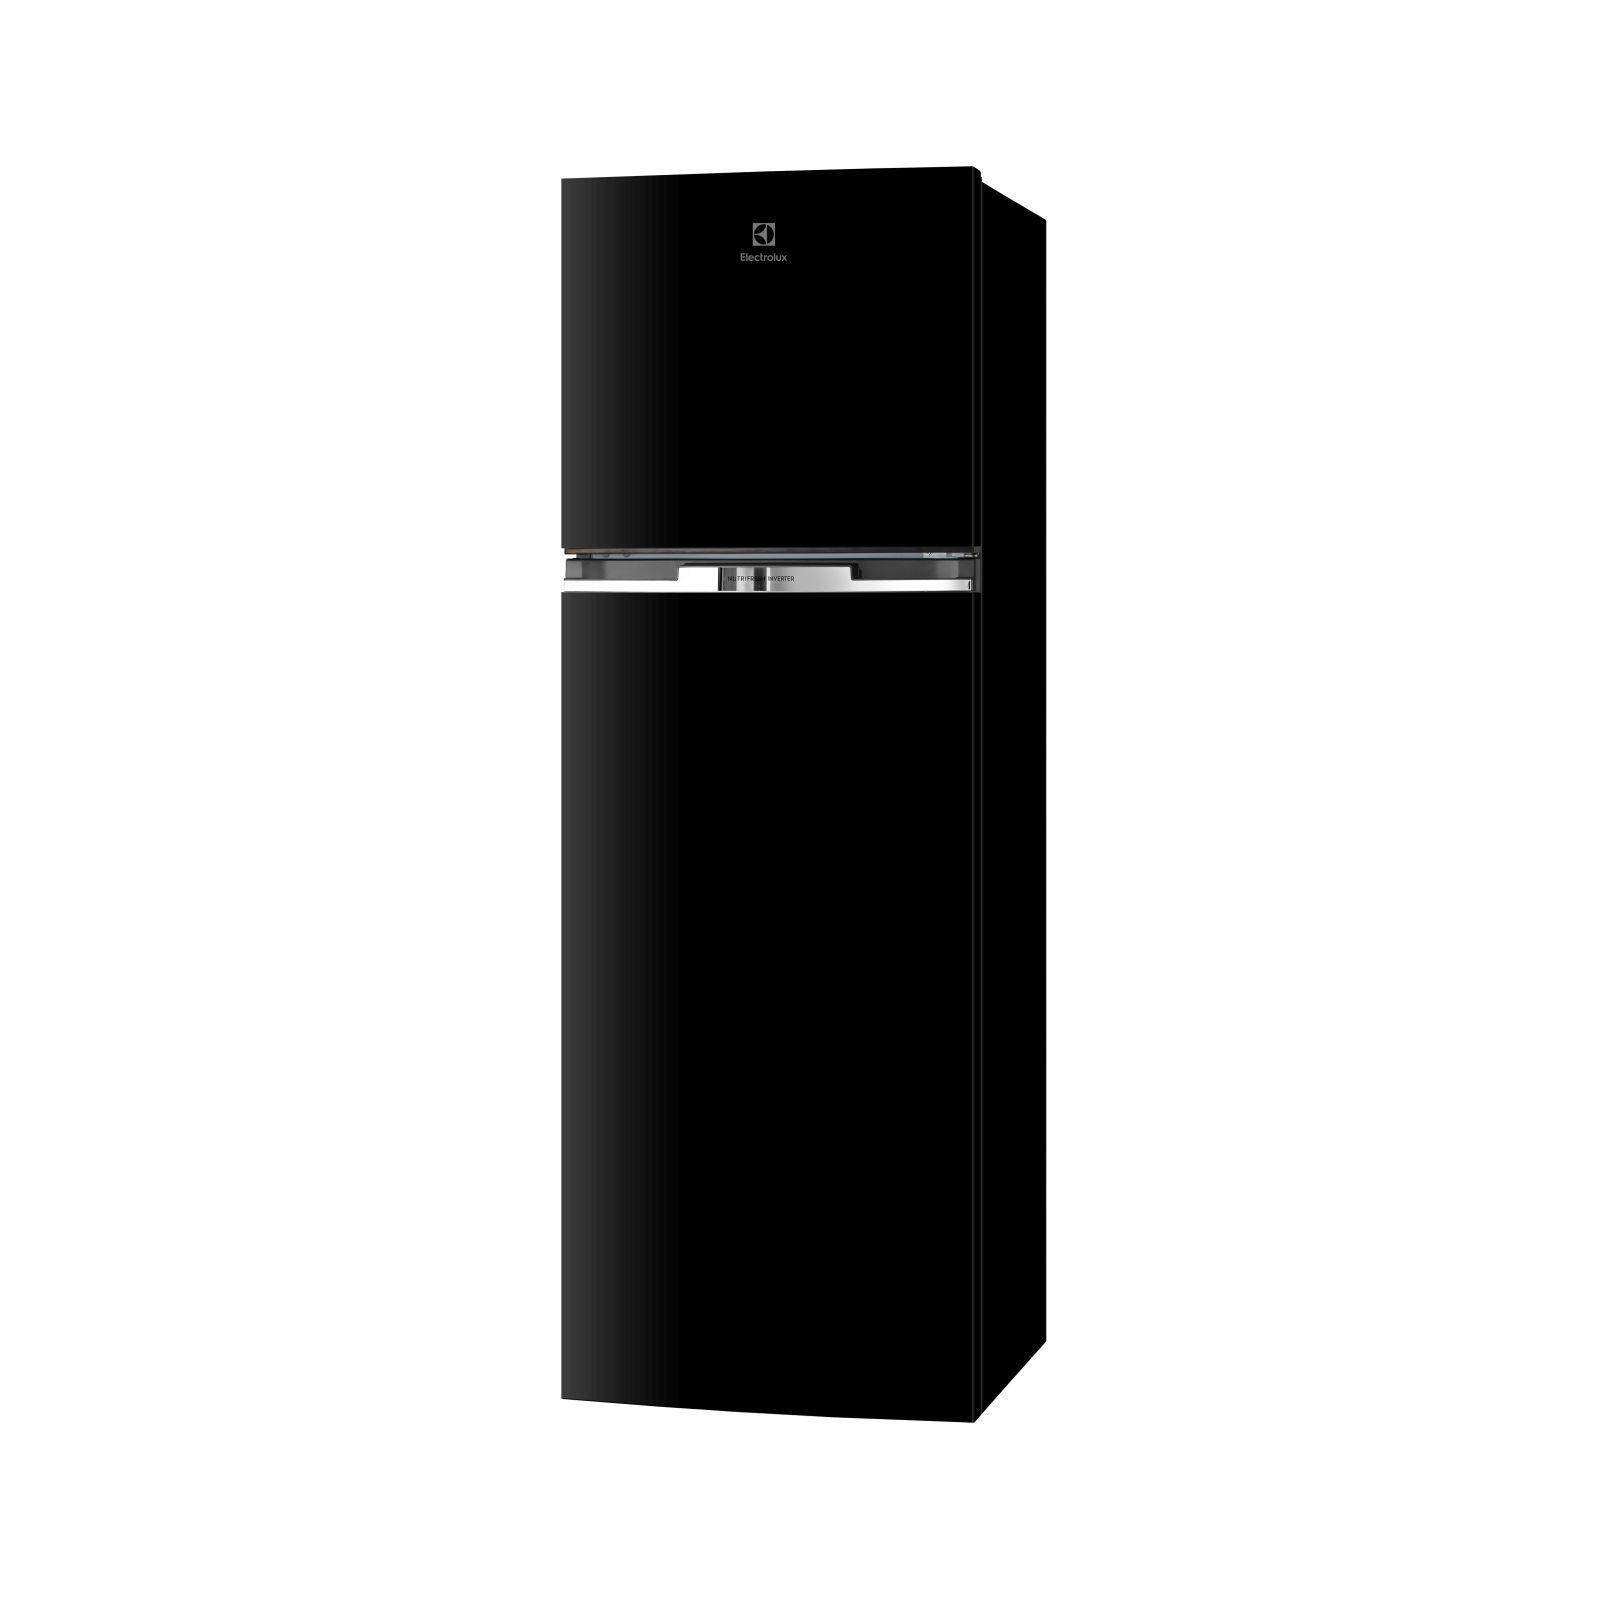 Electrolux 320L NutriFresh® Inverter Top Mount Fridge - High Gloss Black ETB3400H-H